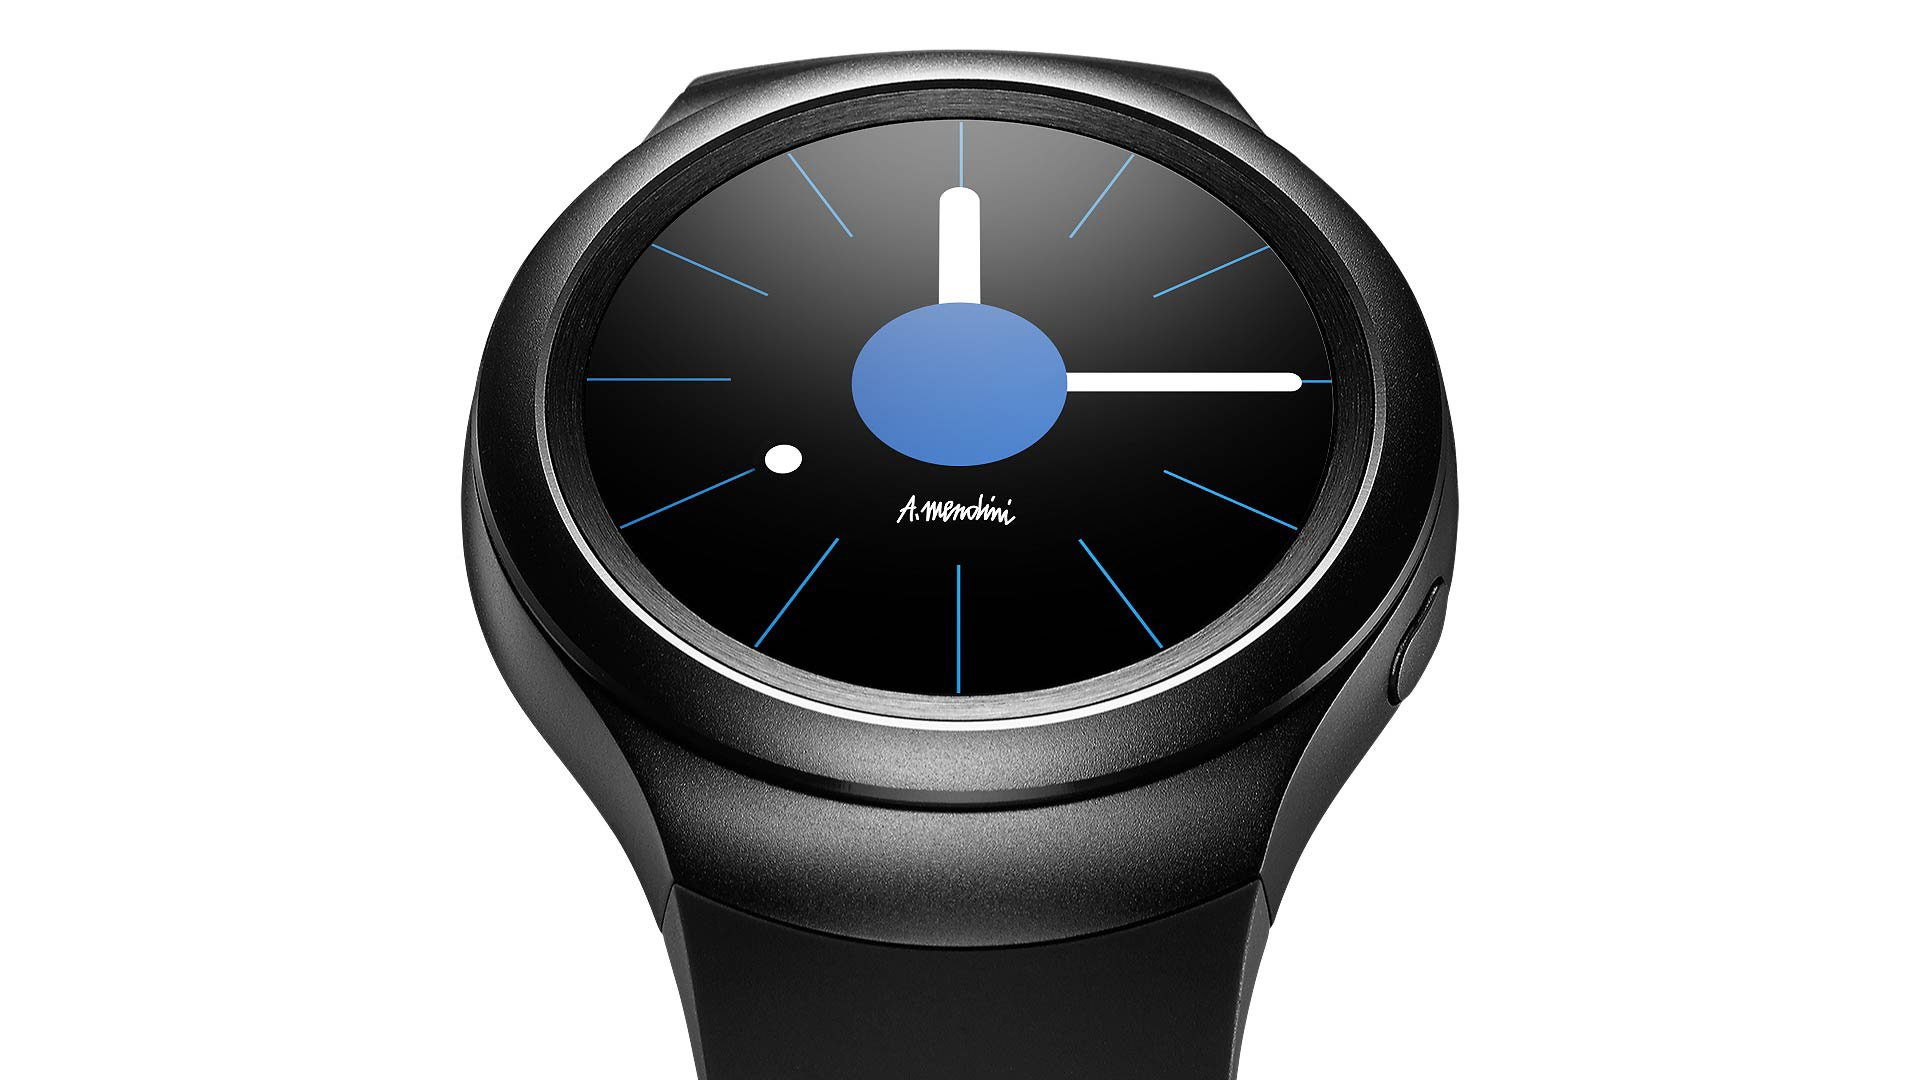 Samsung Gear S2 Smartwatch (Certified Refurbished) (Dark Gray) by Samsung (Image #1)